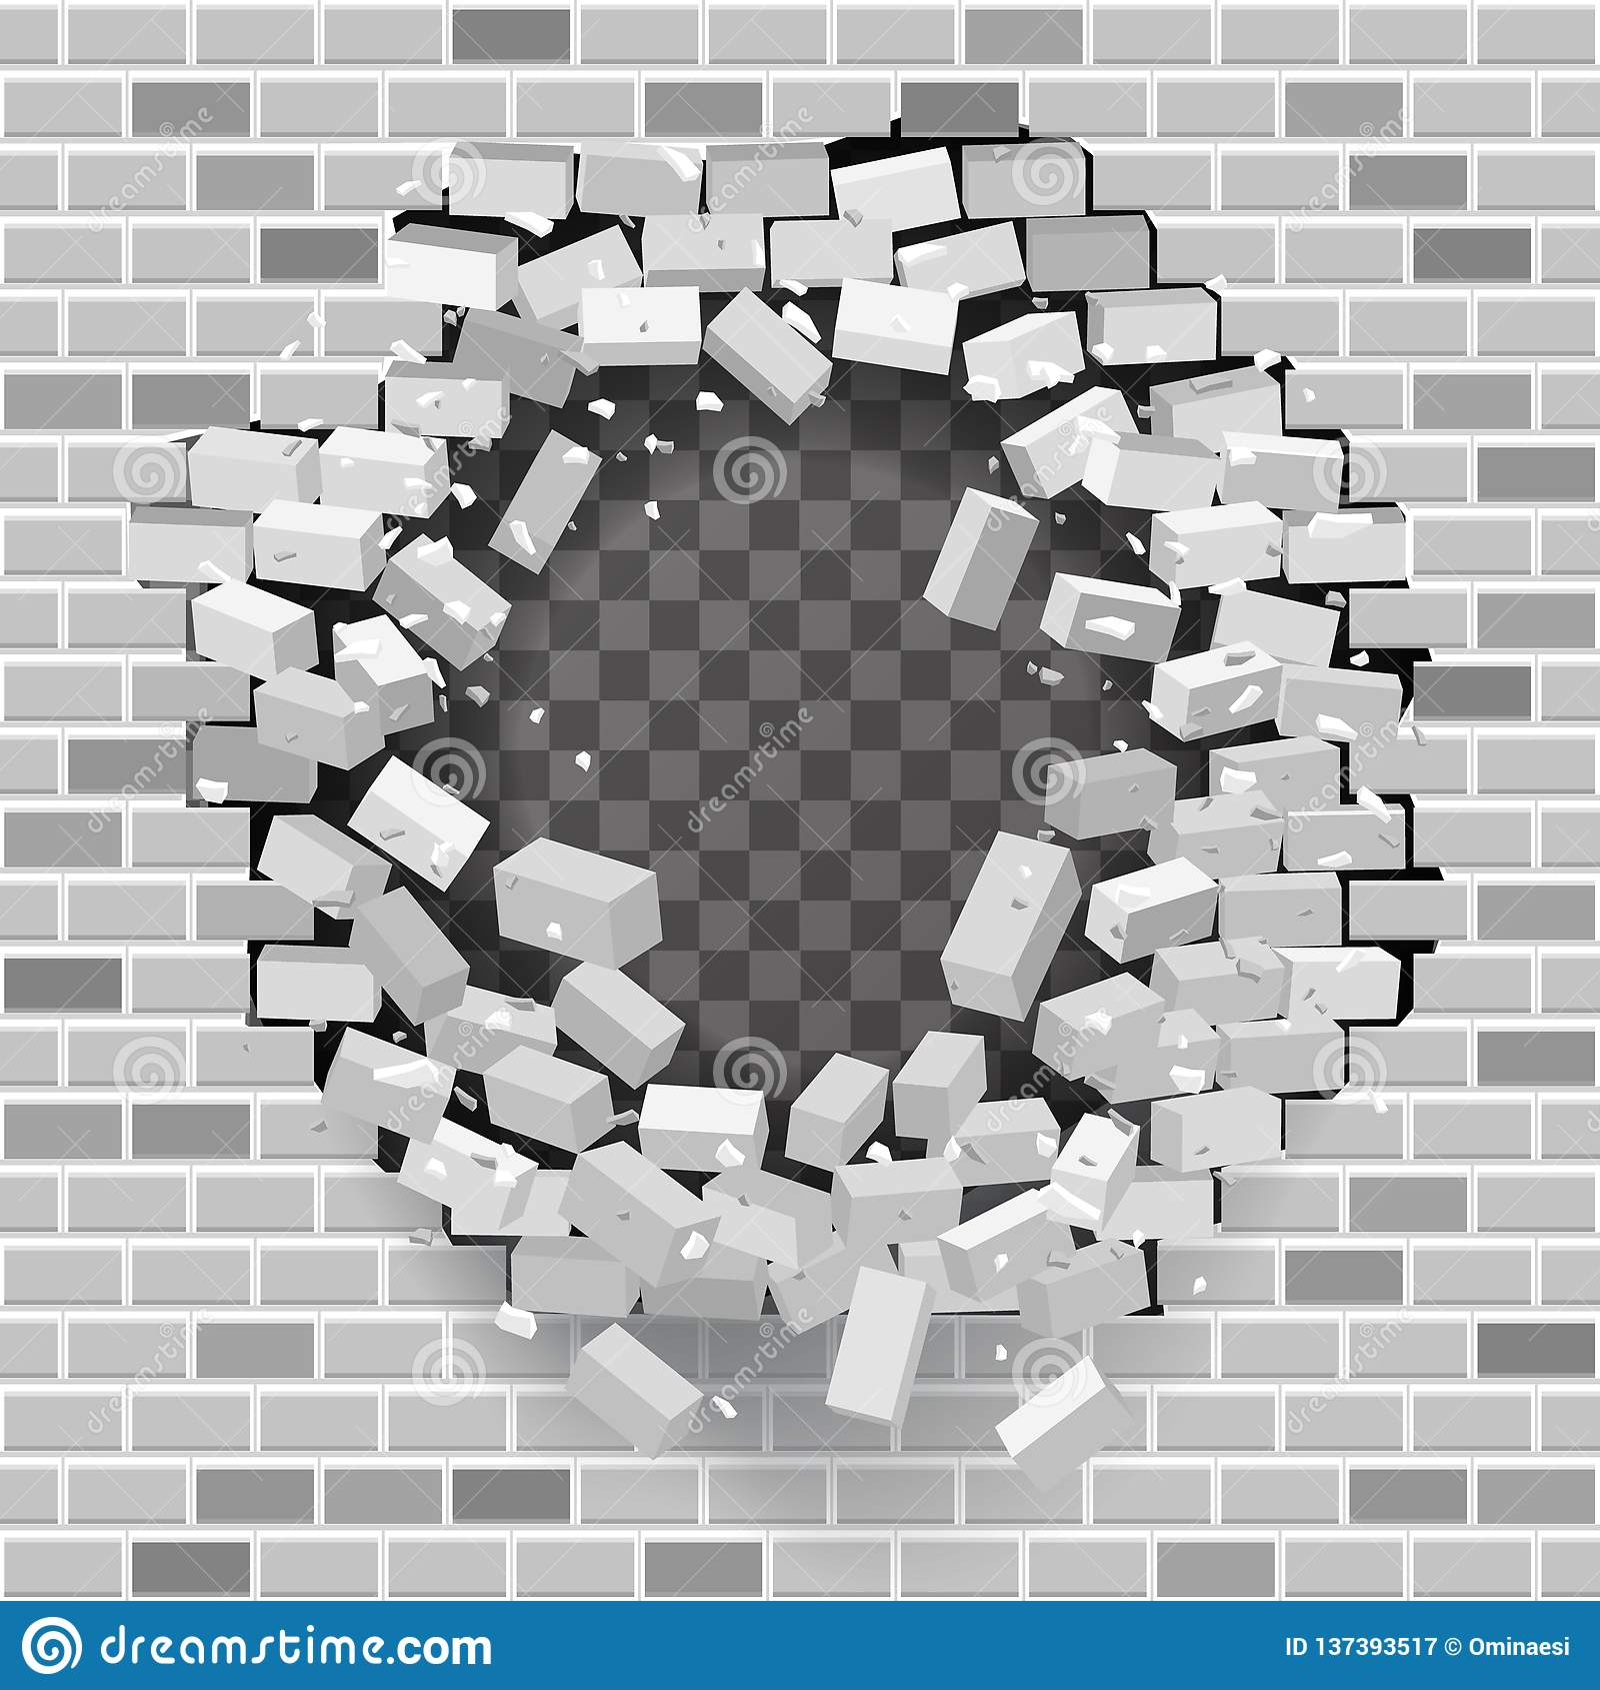 White Grey Brick Break Wall Hole Destruction Template